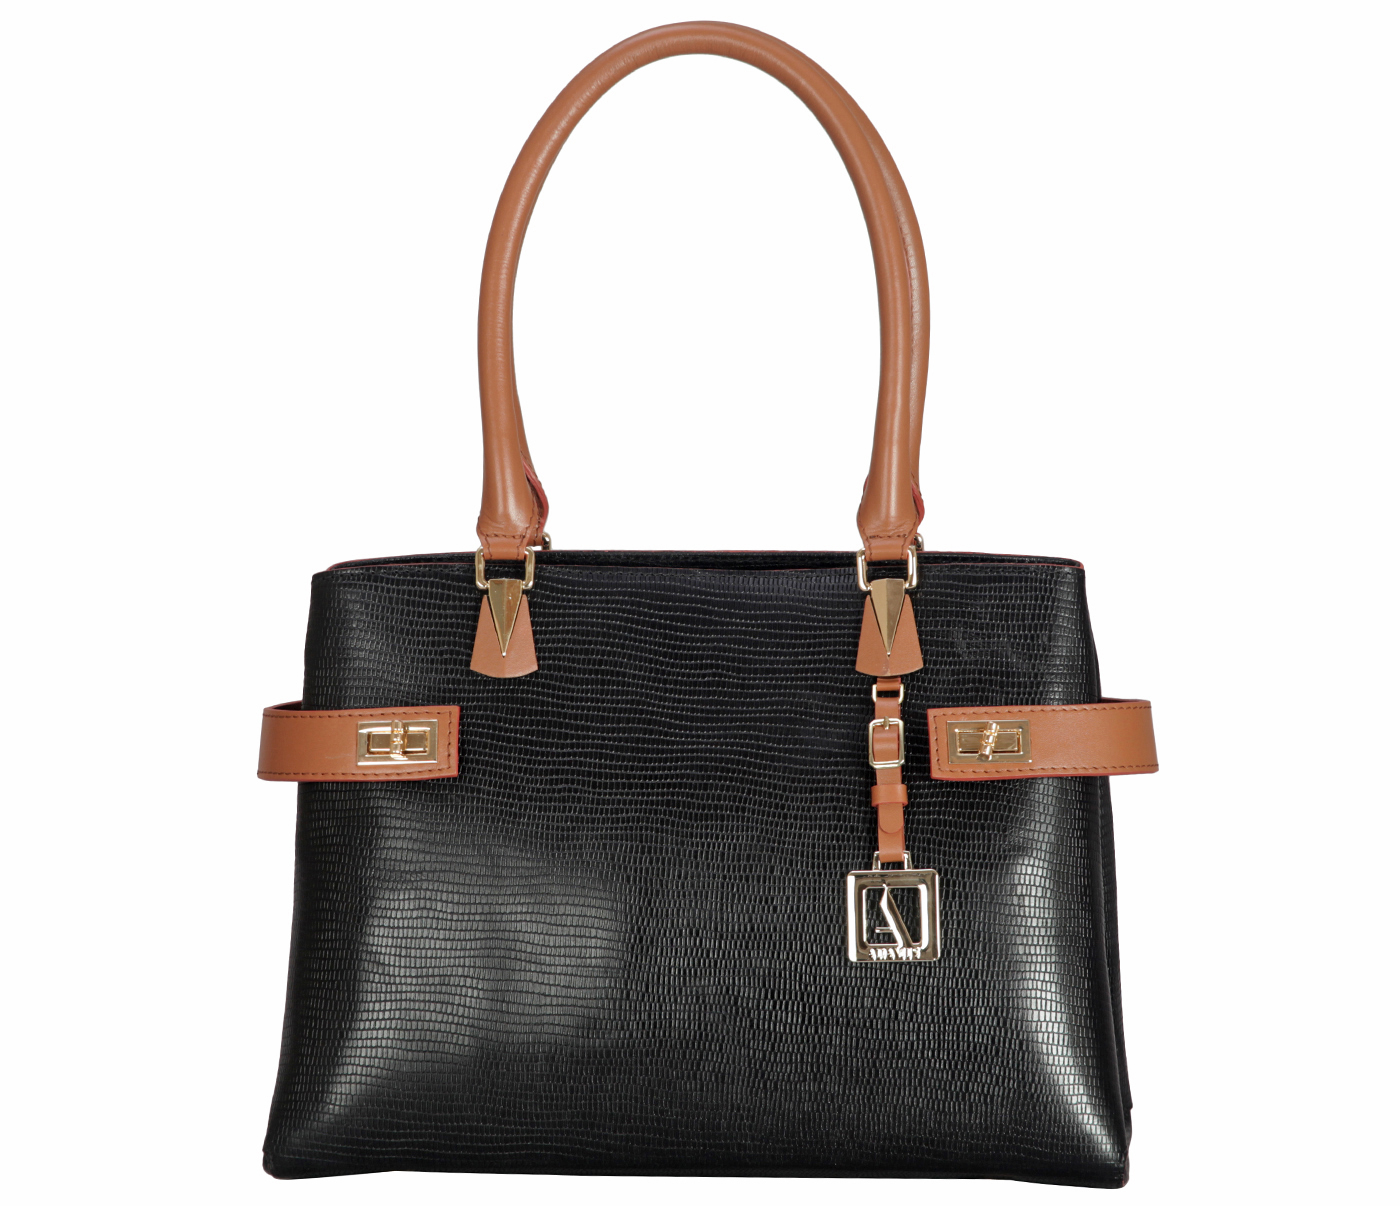 Handbag - B850